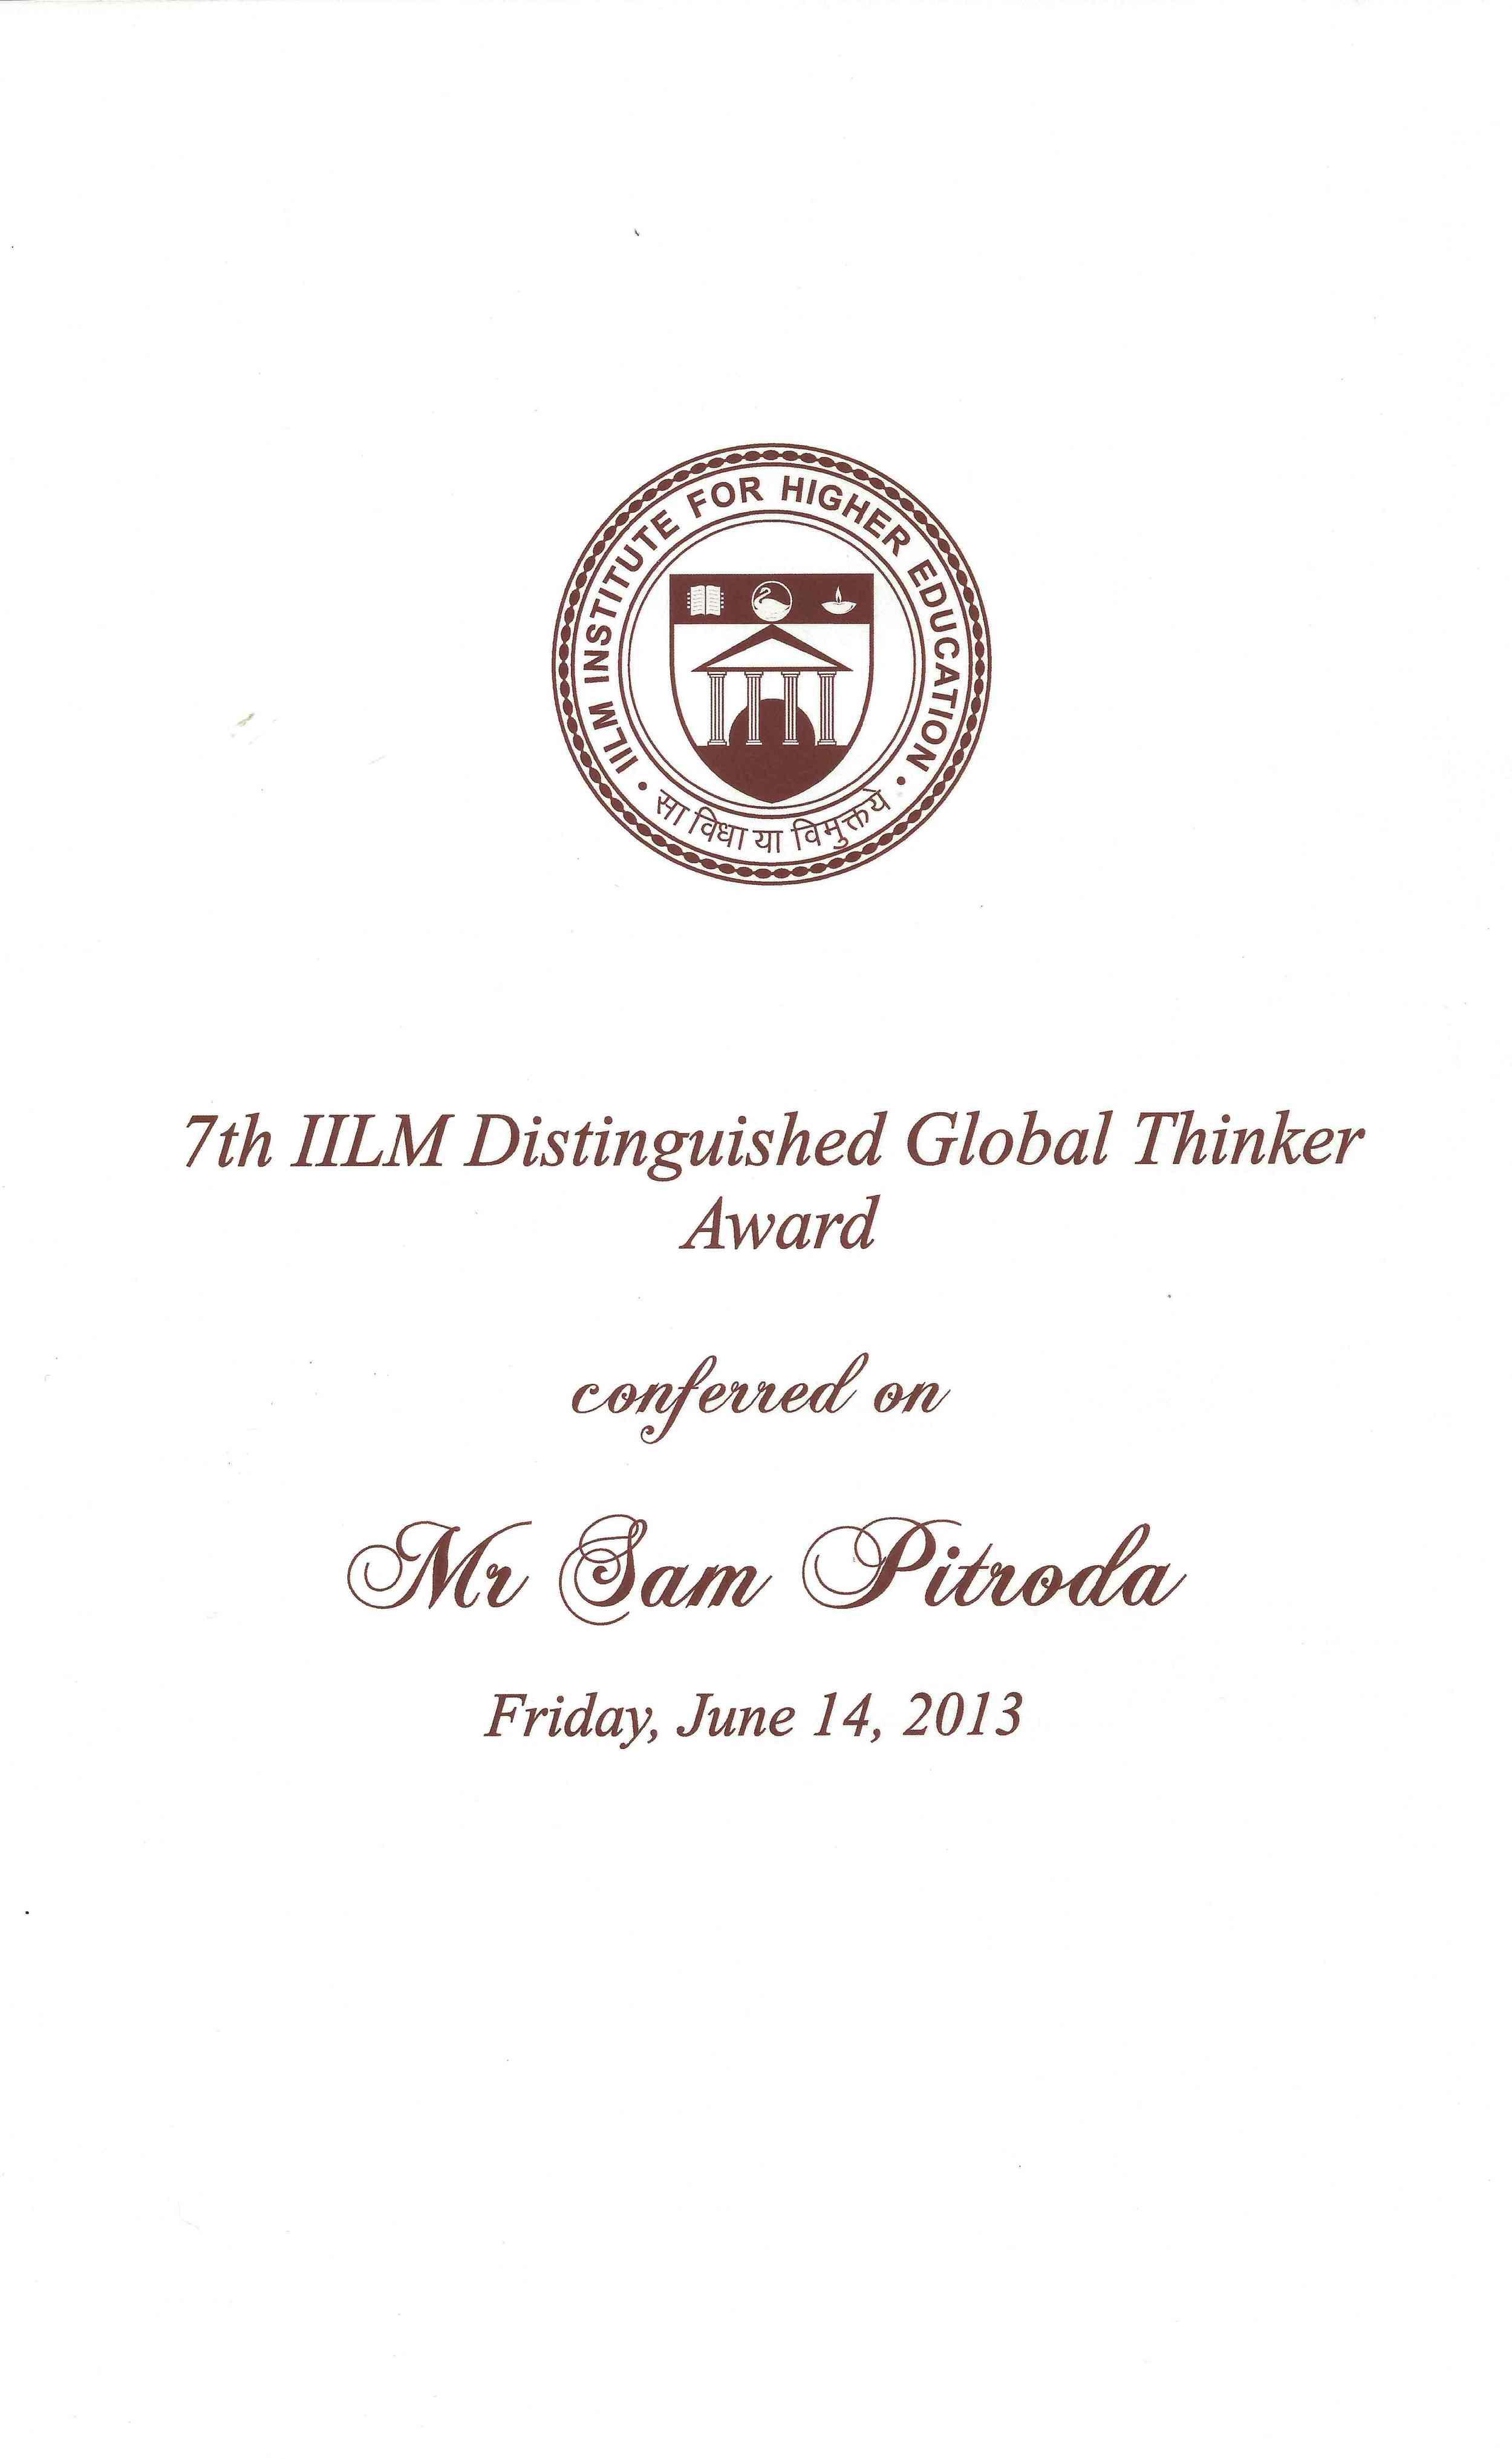 7th IILM Distinguished Global Thinker Award, IILM, 2013